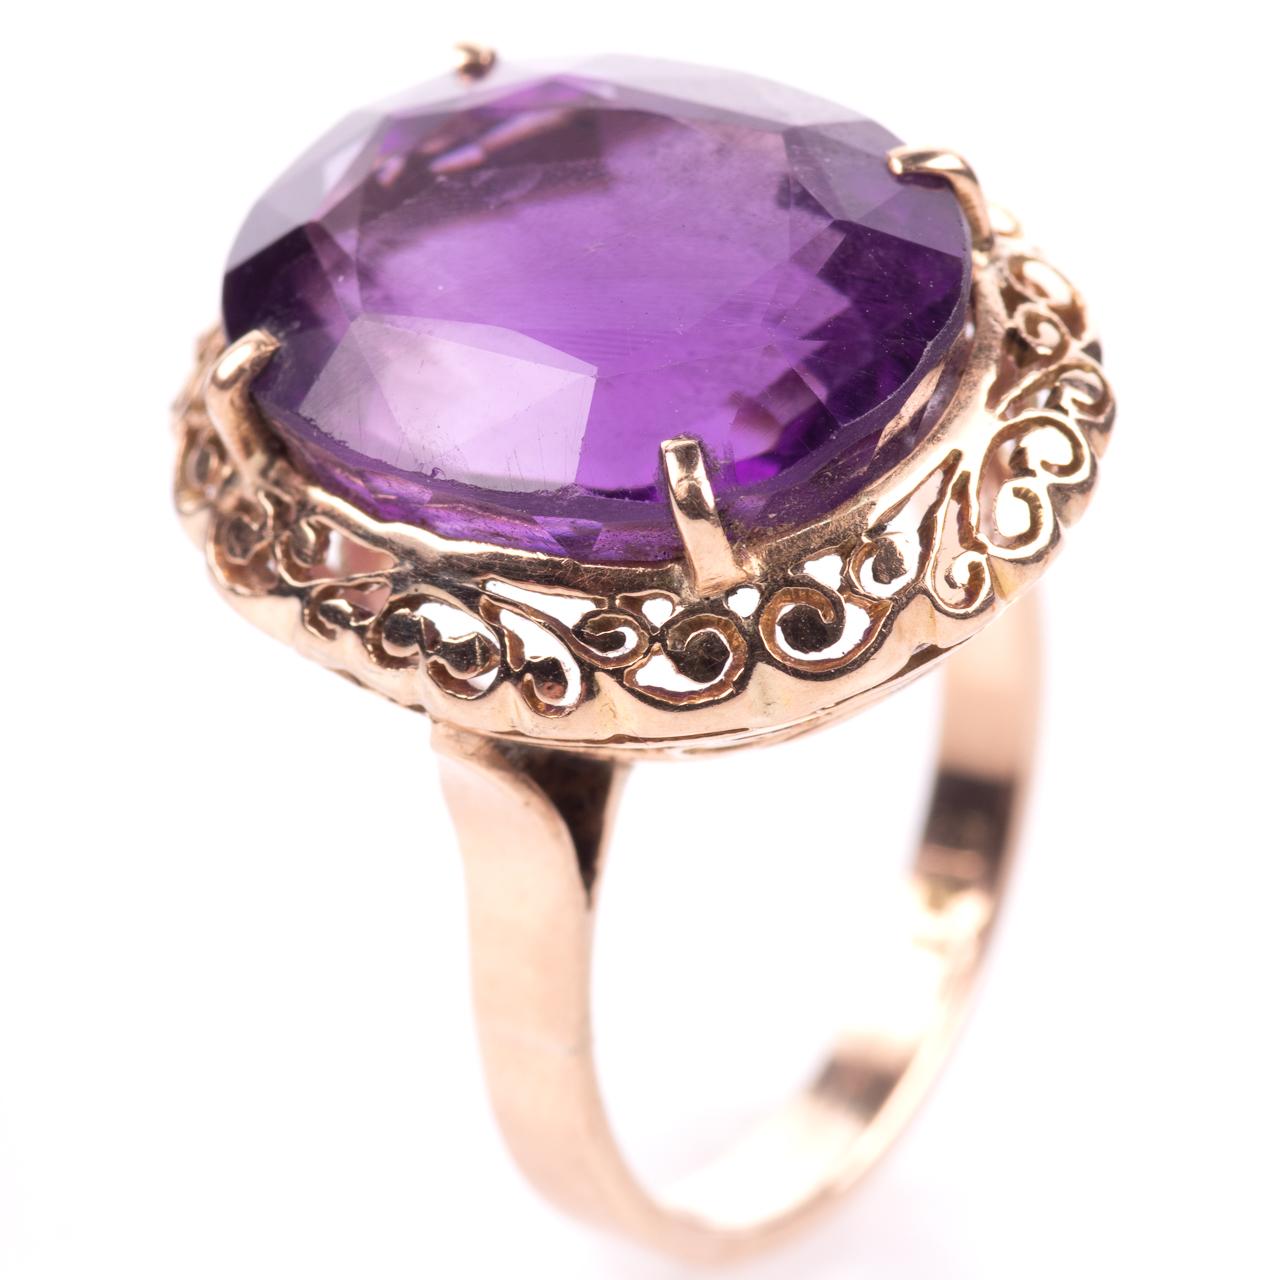 14ct Gold Amethyst Ring